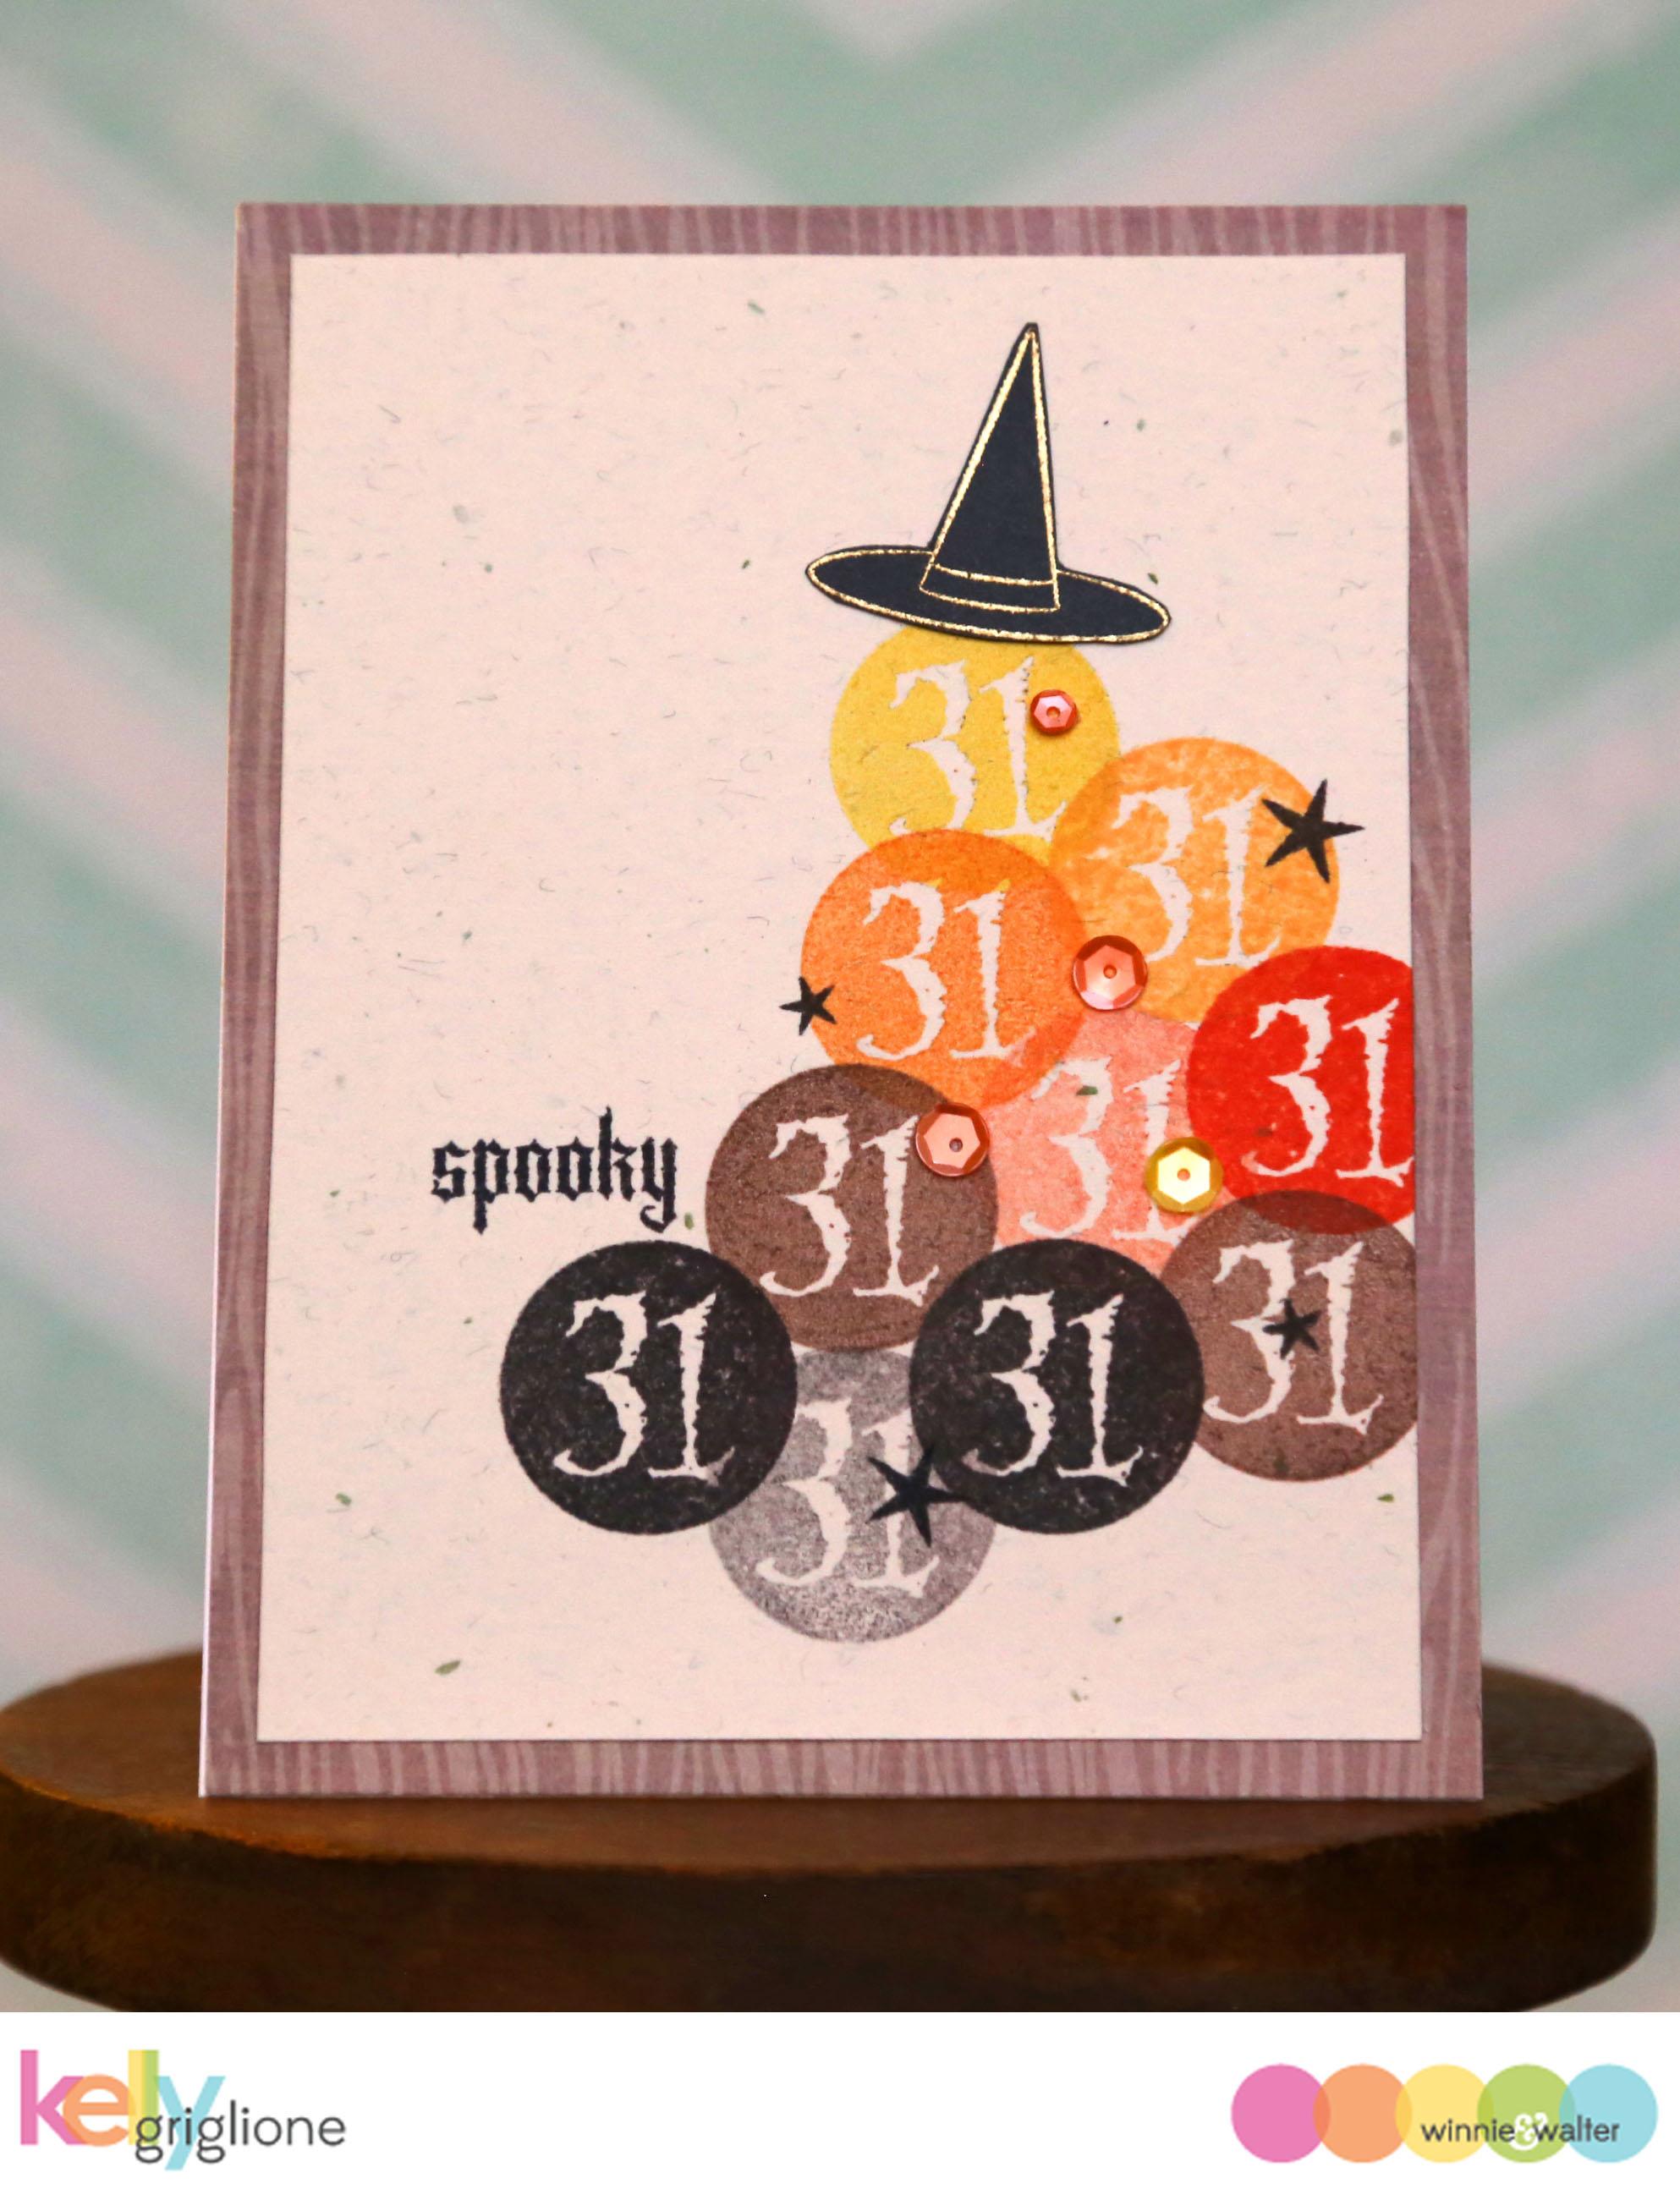 kelly_griglione_Winnie and Walter Moonlight Halloween Card